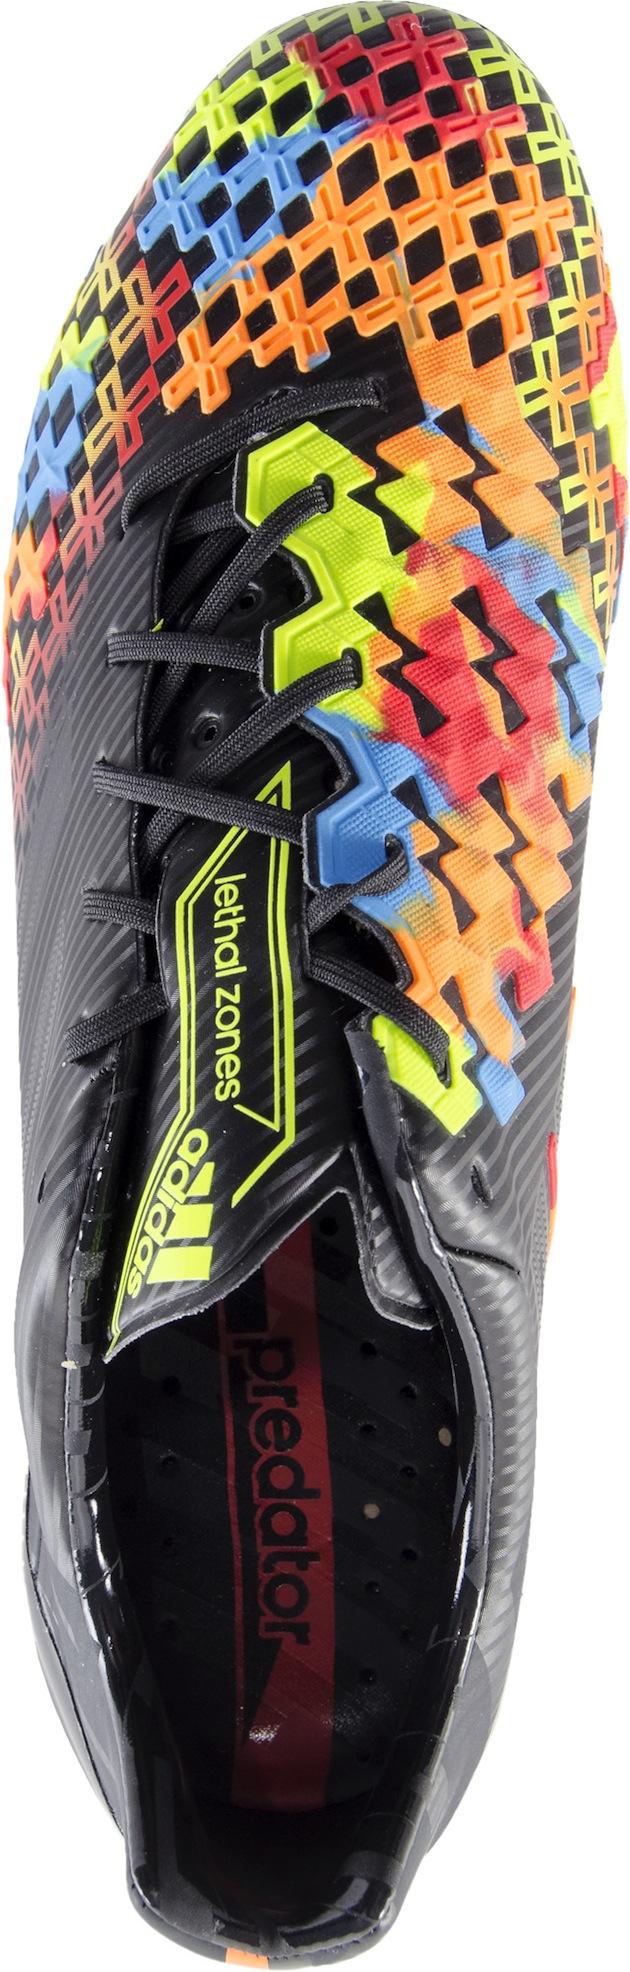 Adidas Predator Lz Trx Fg Sl Blanc rtSHmIX